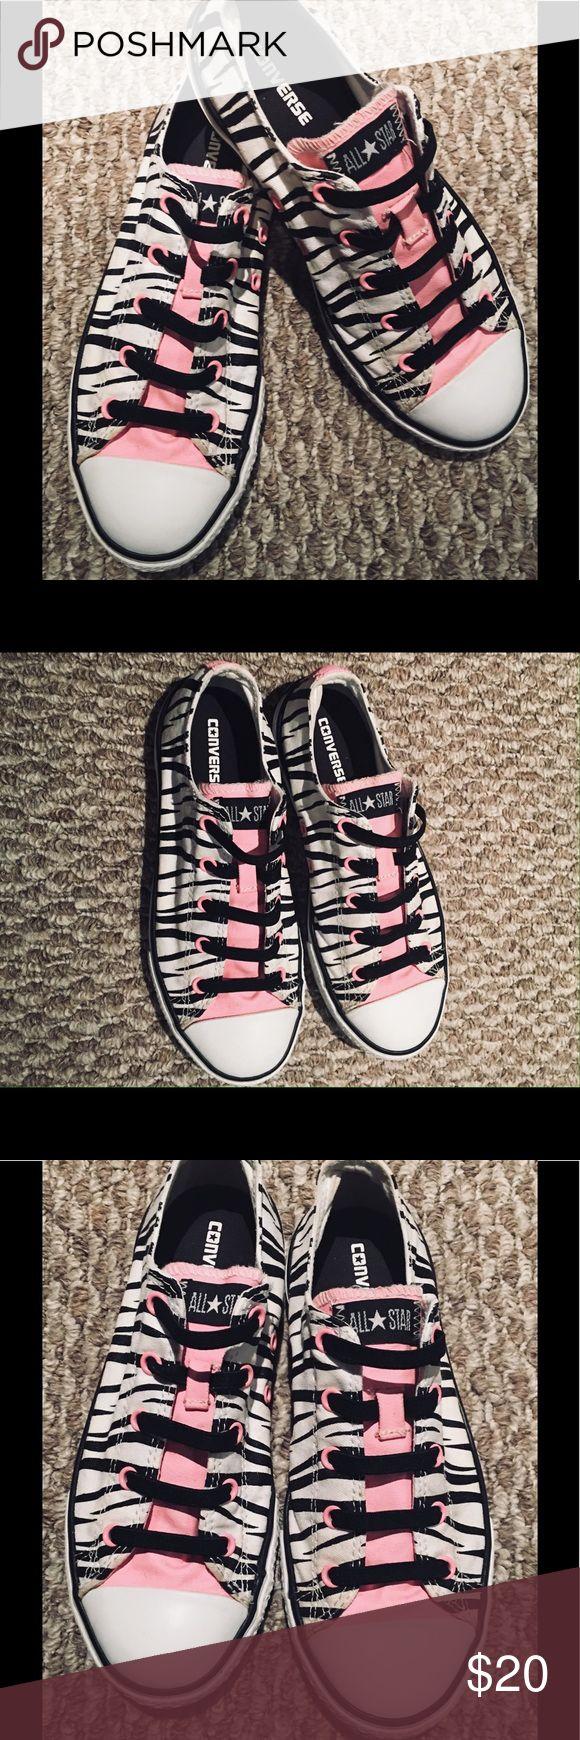 Best 25 Zebra Shoes Ideas On Pinterest Black Heels With